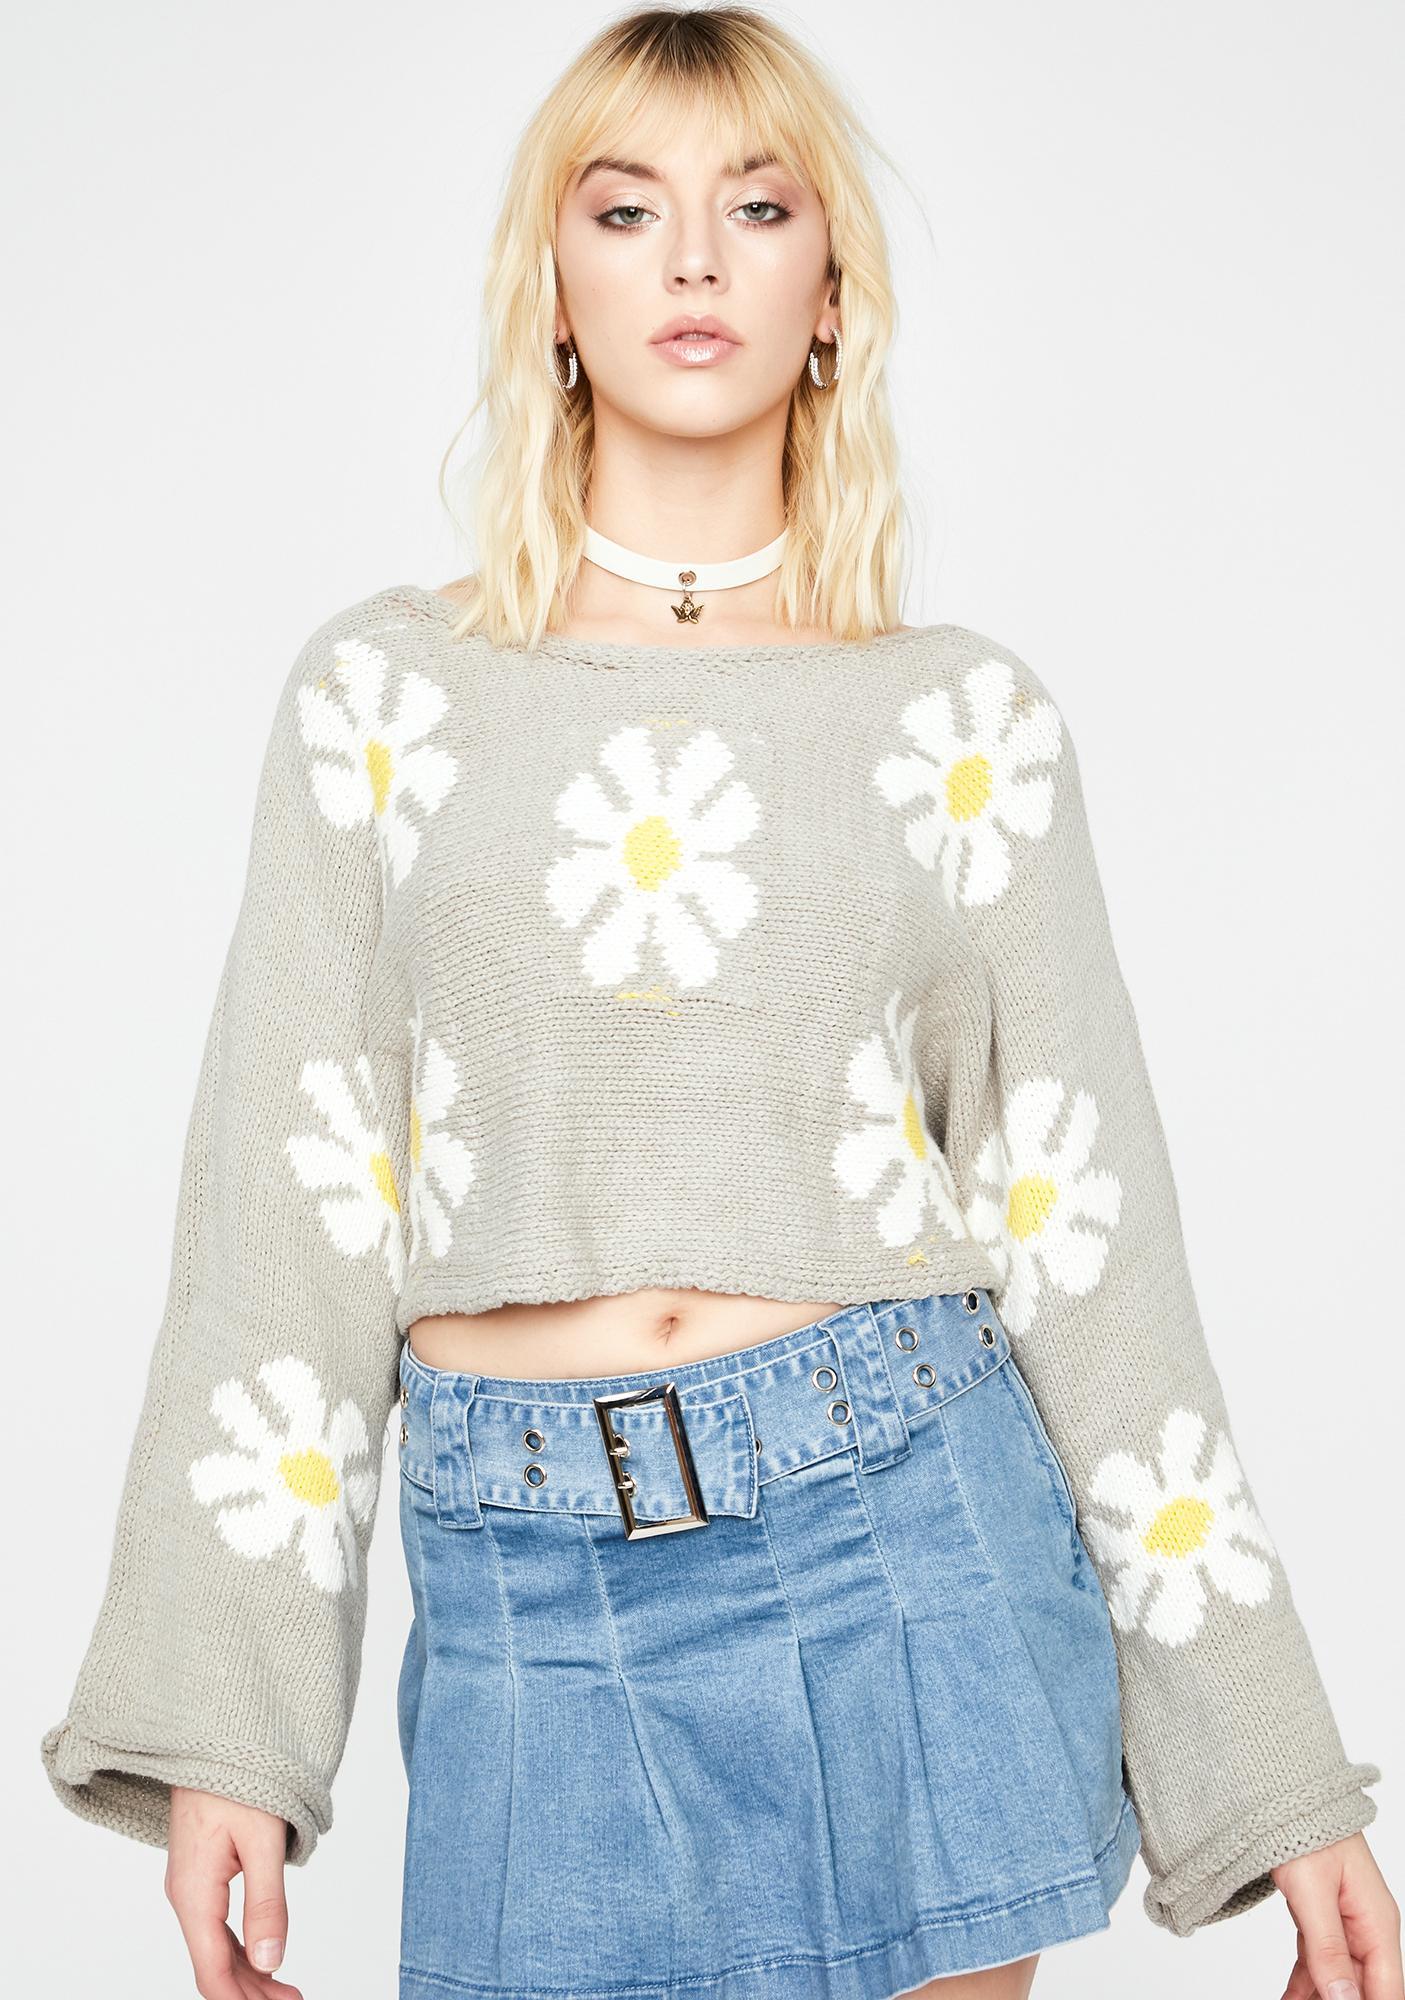 Daisy Daydream Knit Sweater